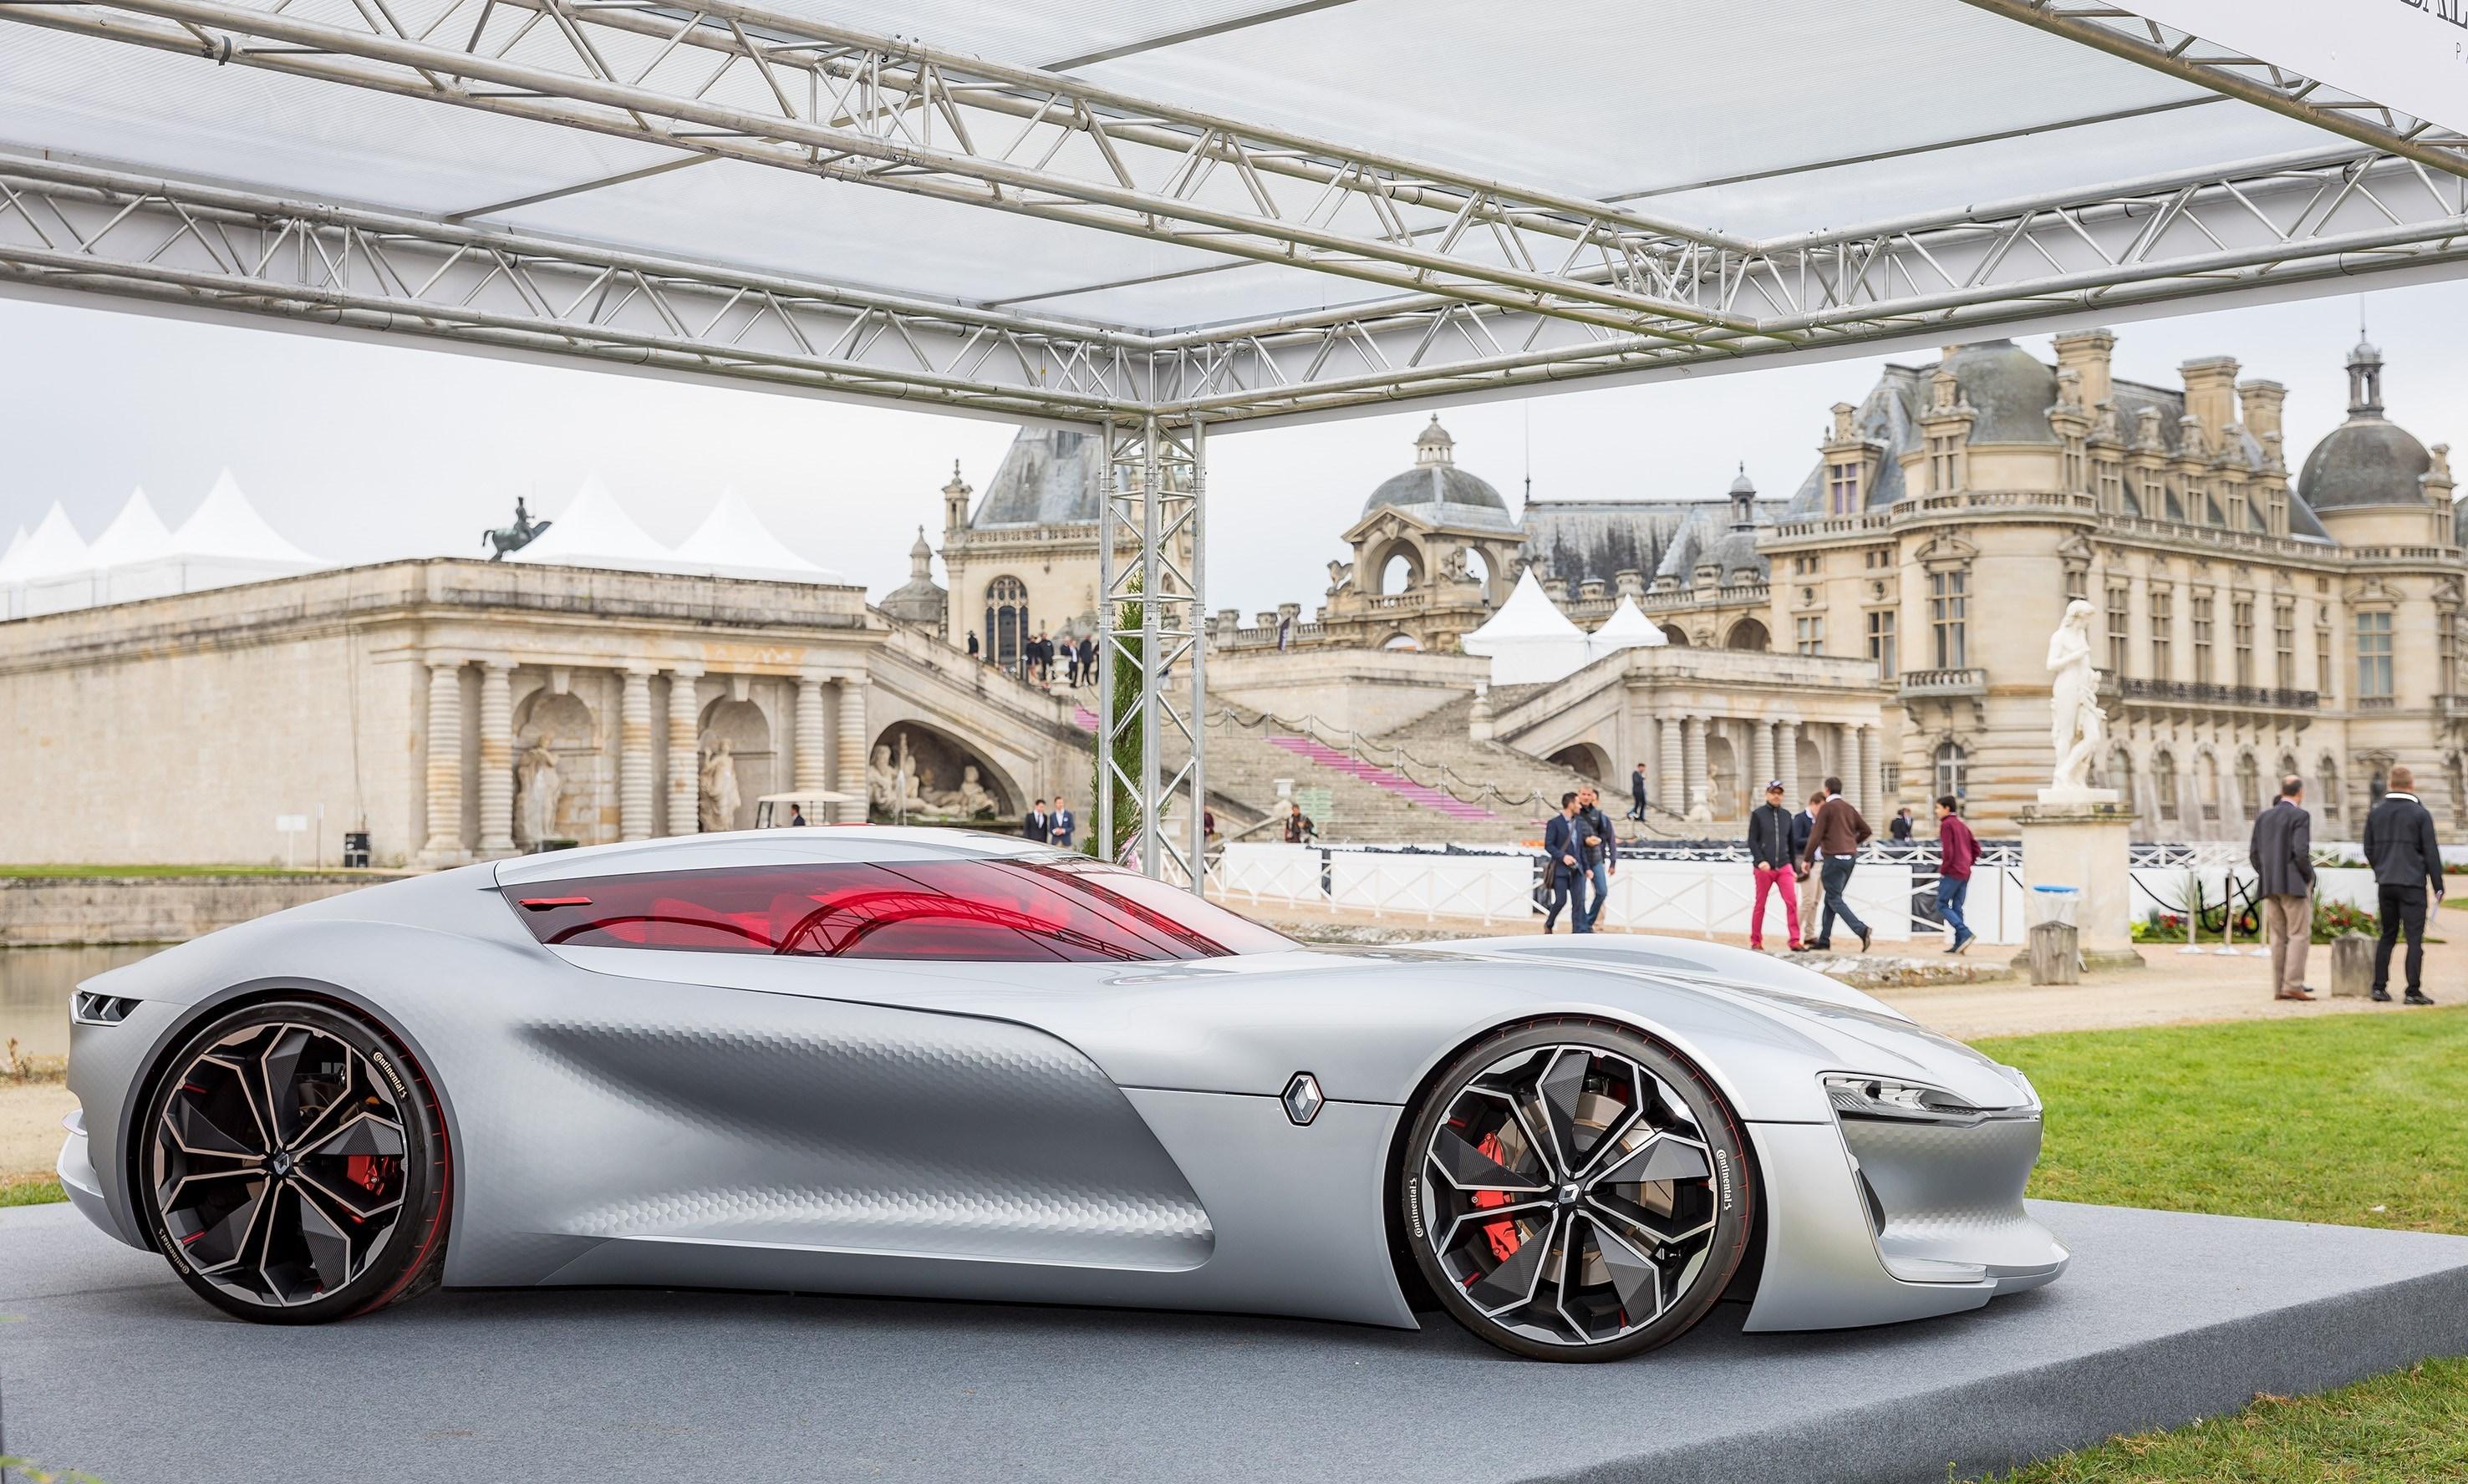 A fifth award for the Renault TREZOR concept car